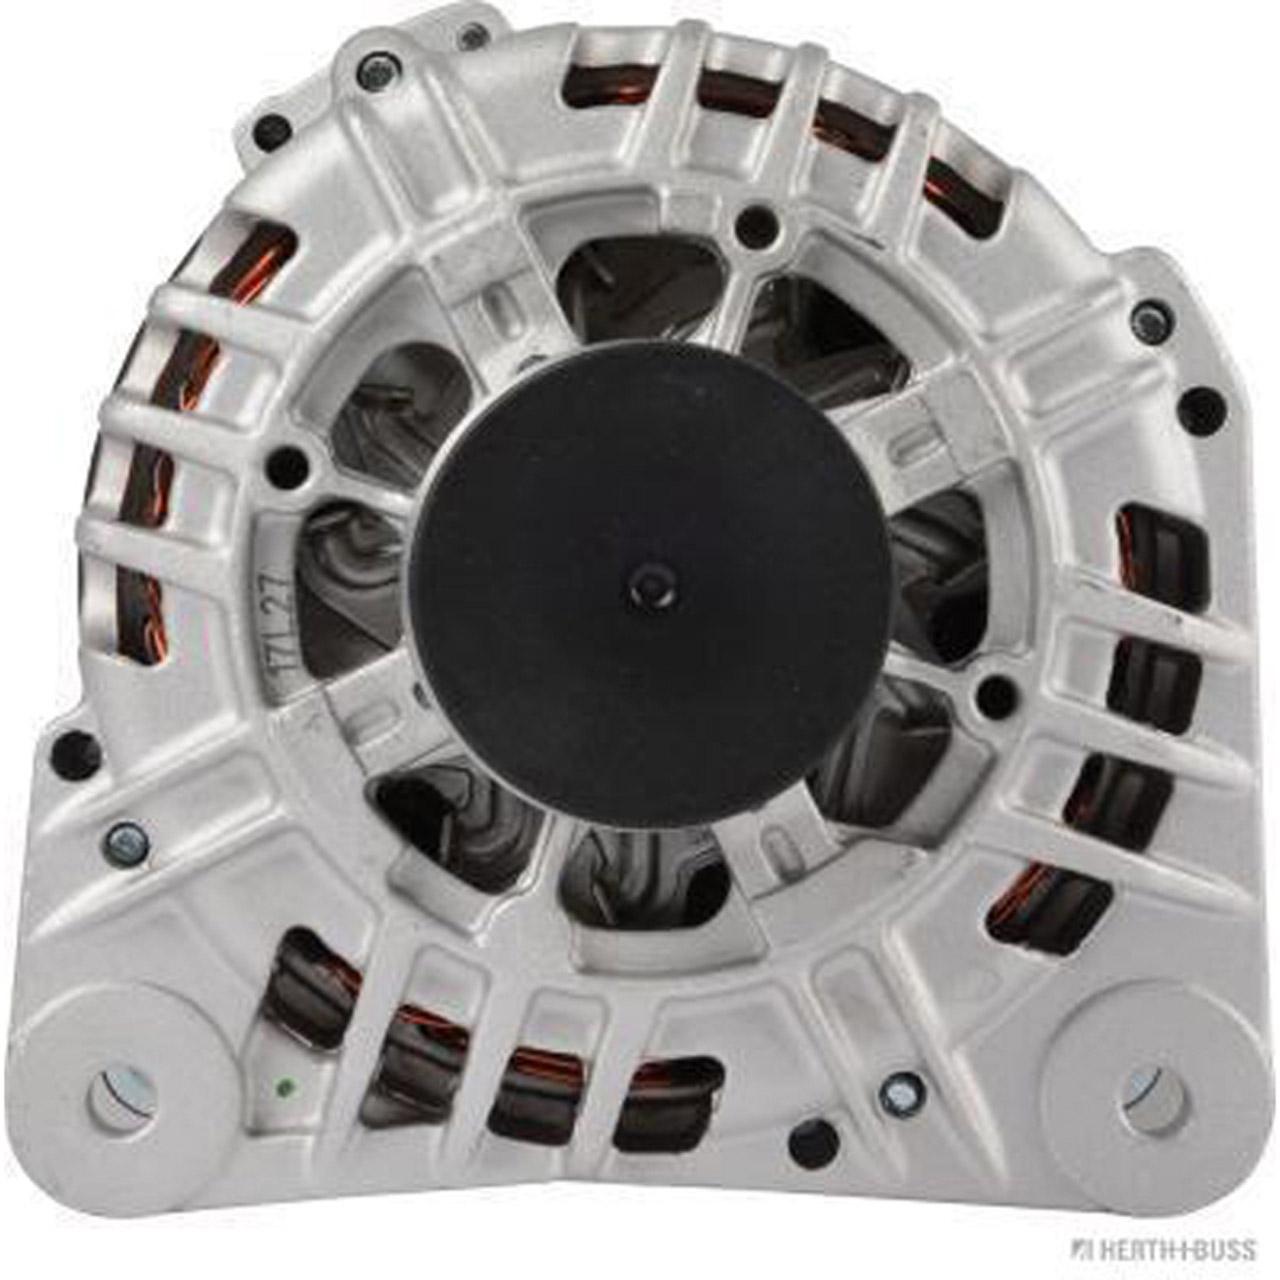 HERTH+BUSS Lichtmaschine 14V 125A RENAULT Clio 2 Kangoo Twingo 2 1.5 dCi